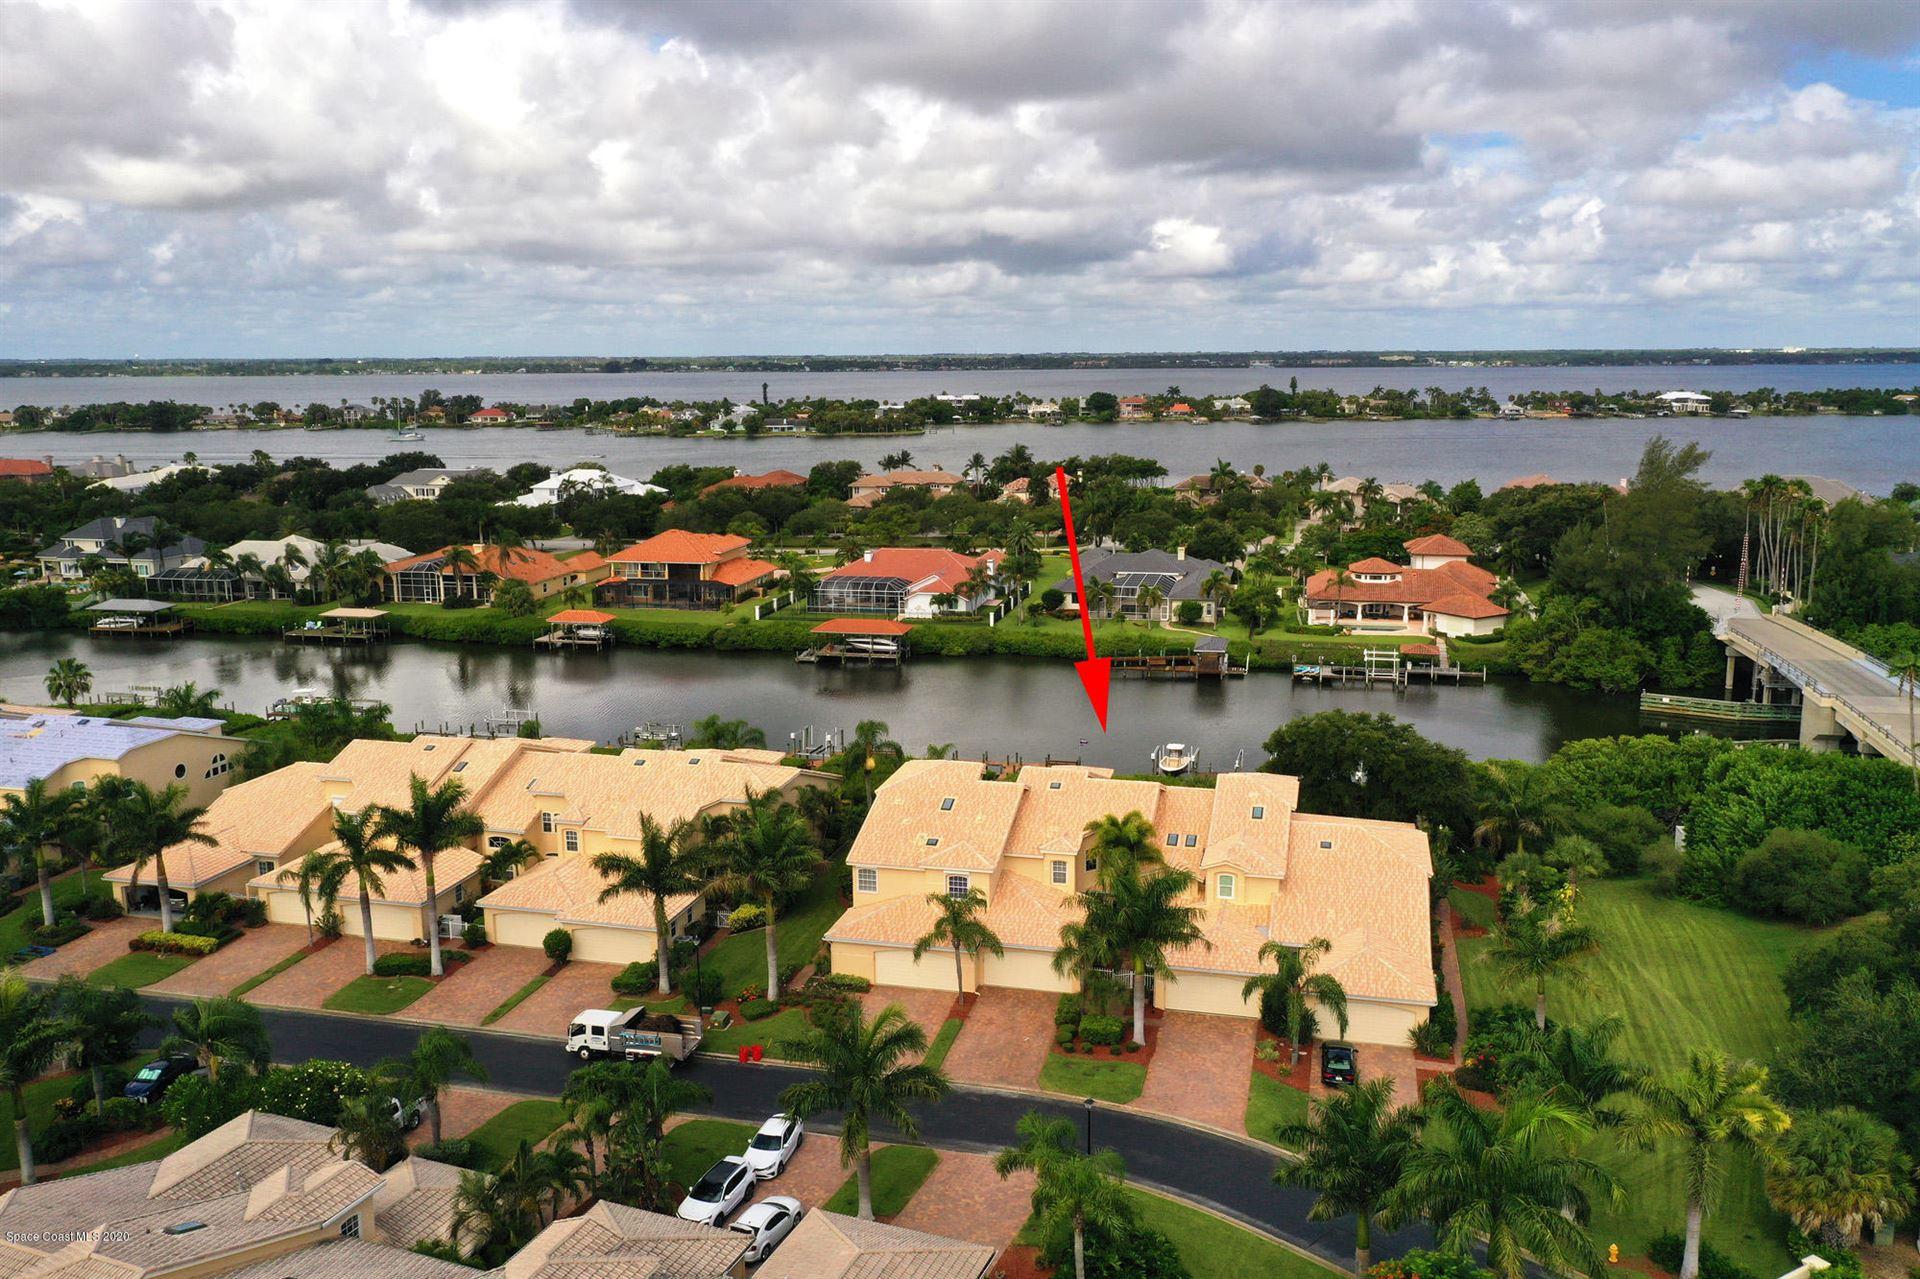 507 Island Court, Indian Harbour Beach, FL 32937 - #: 881280